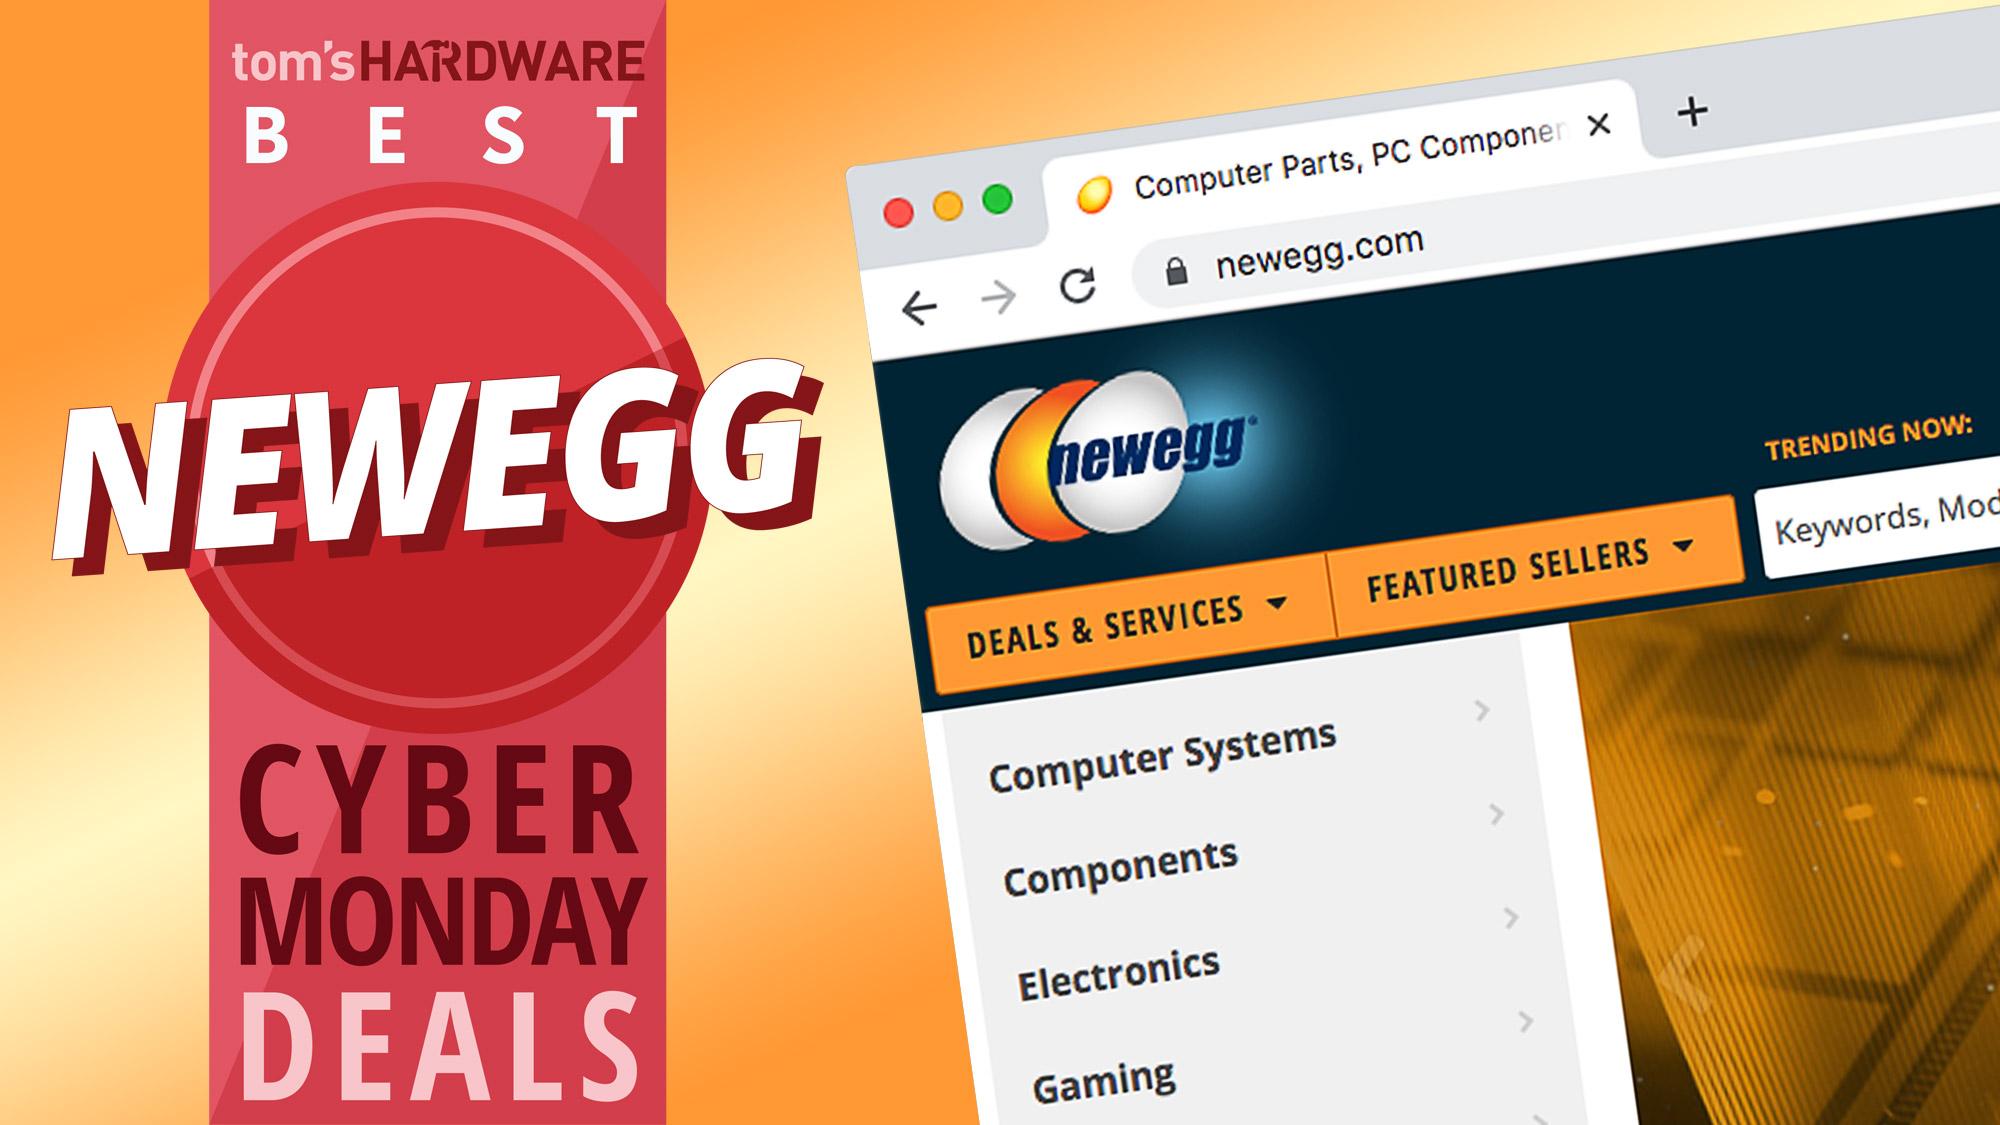 Best Newegg Cyber Monday Deals 2019 Tom S Hardware